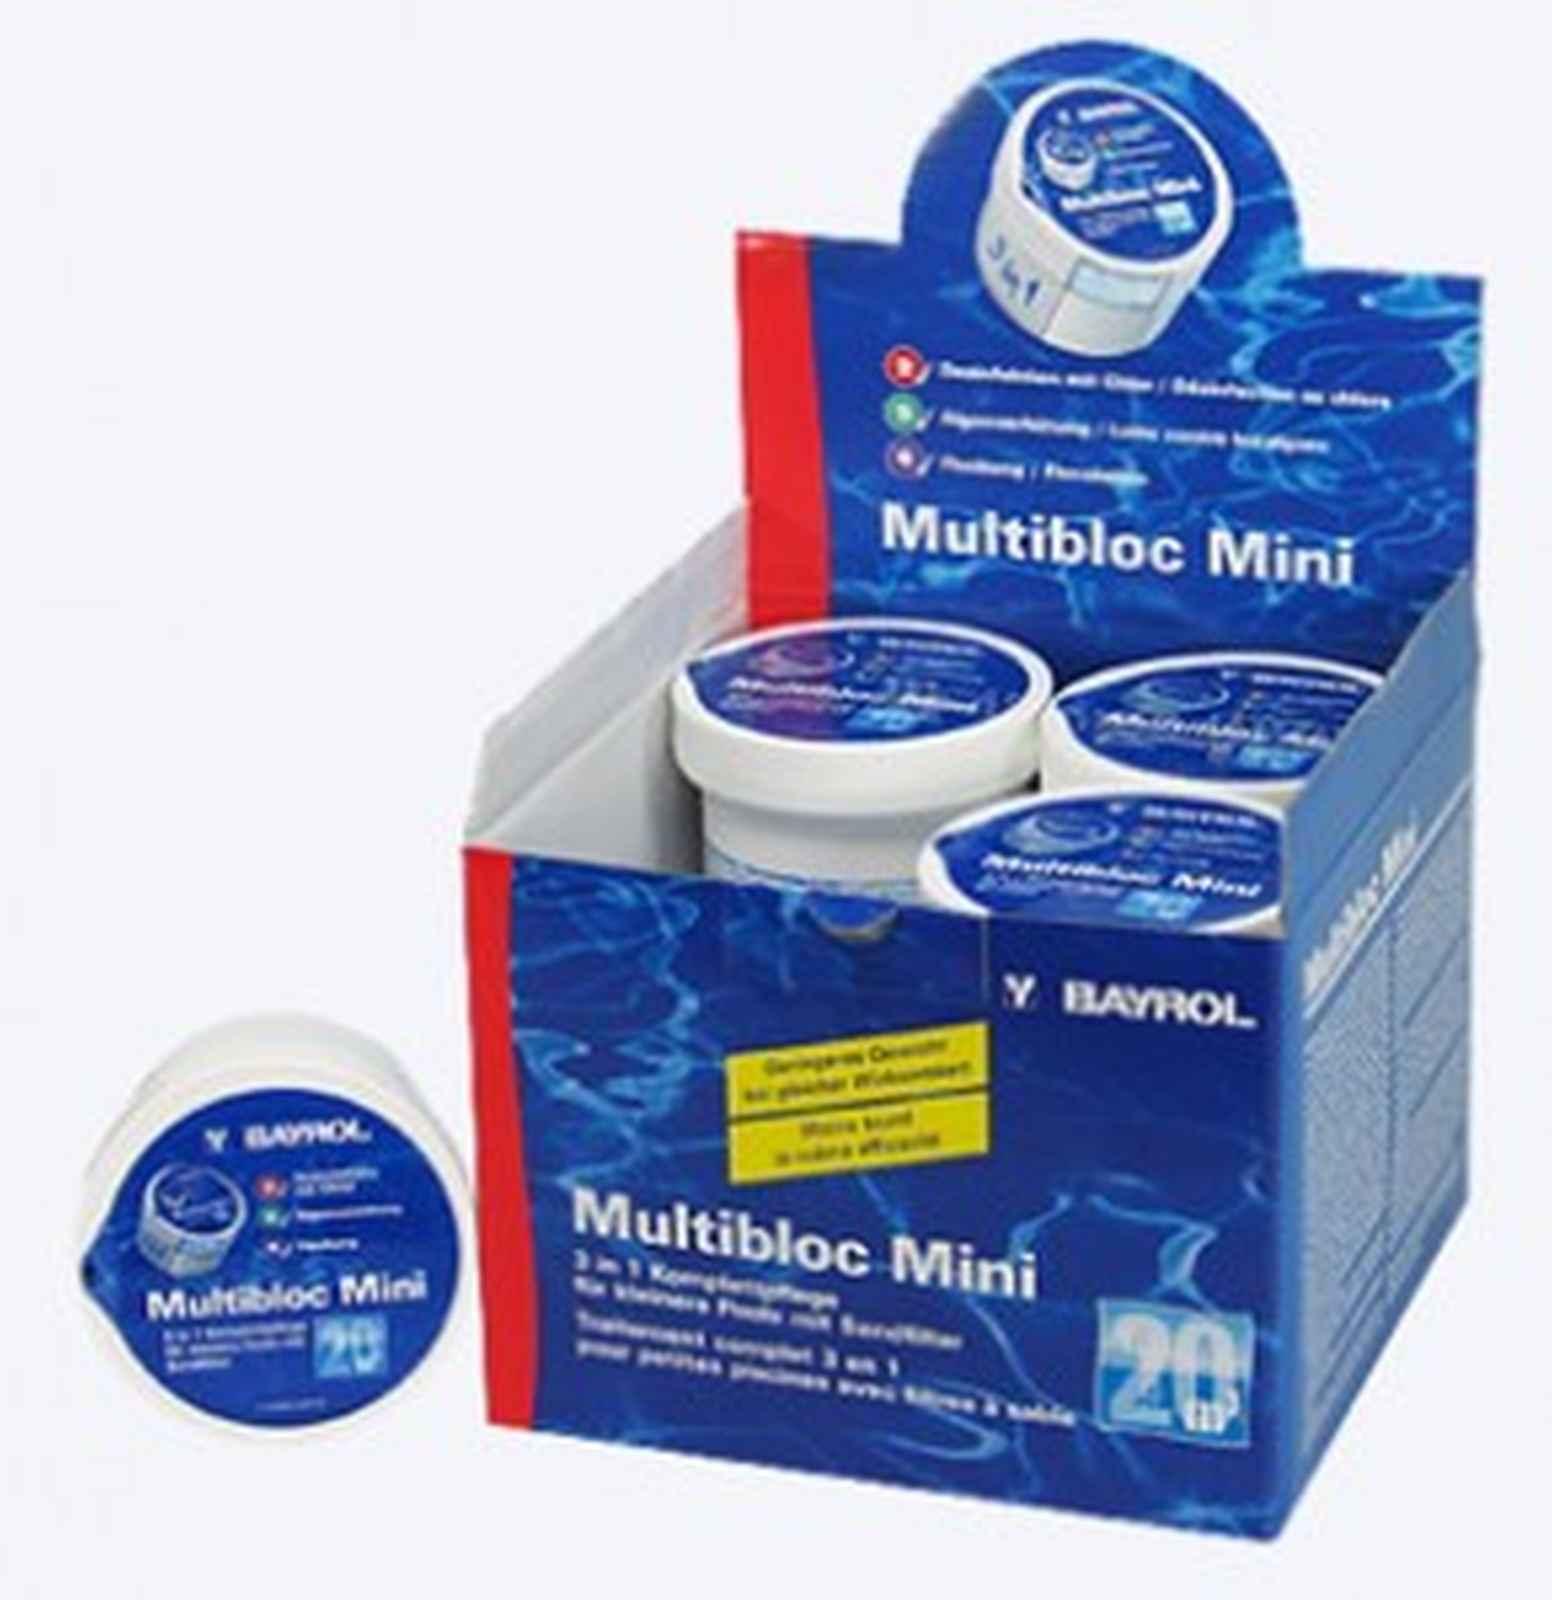 Multibloc_Mini_Karton1